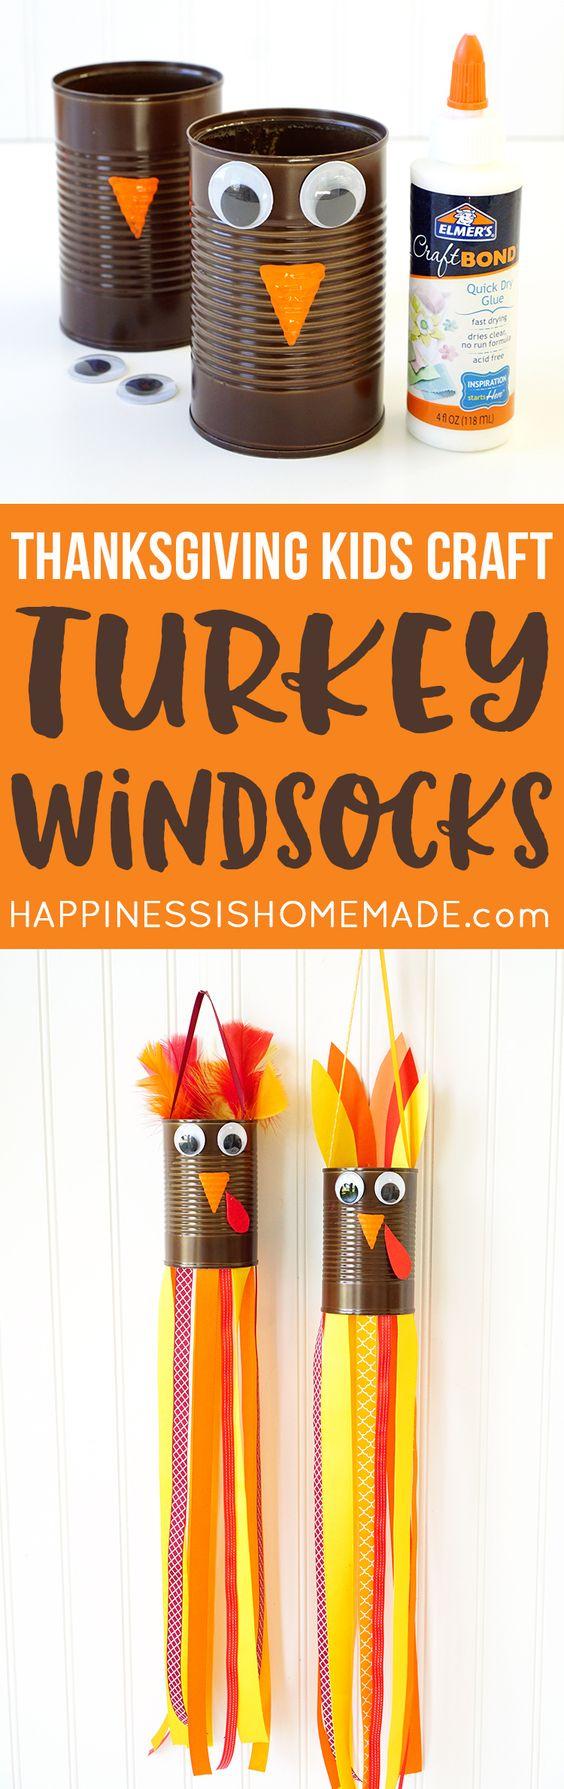 Turkey Windsocks.